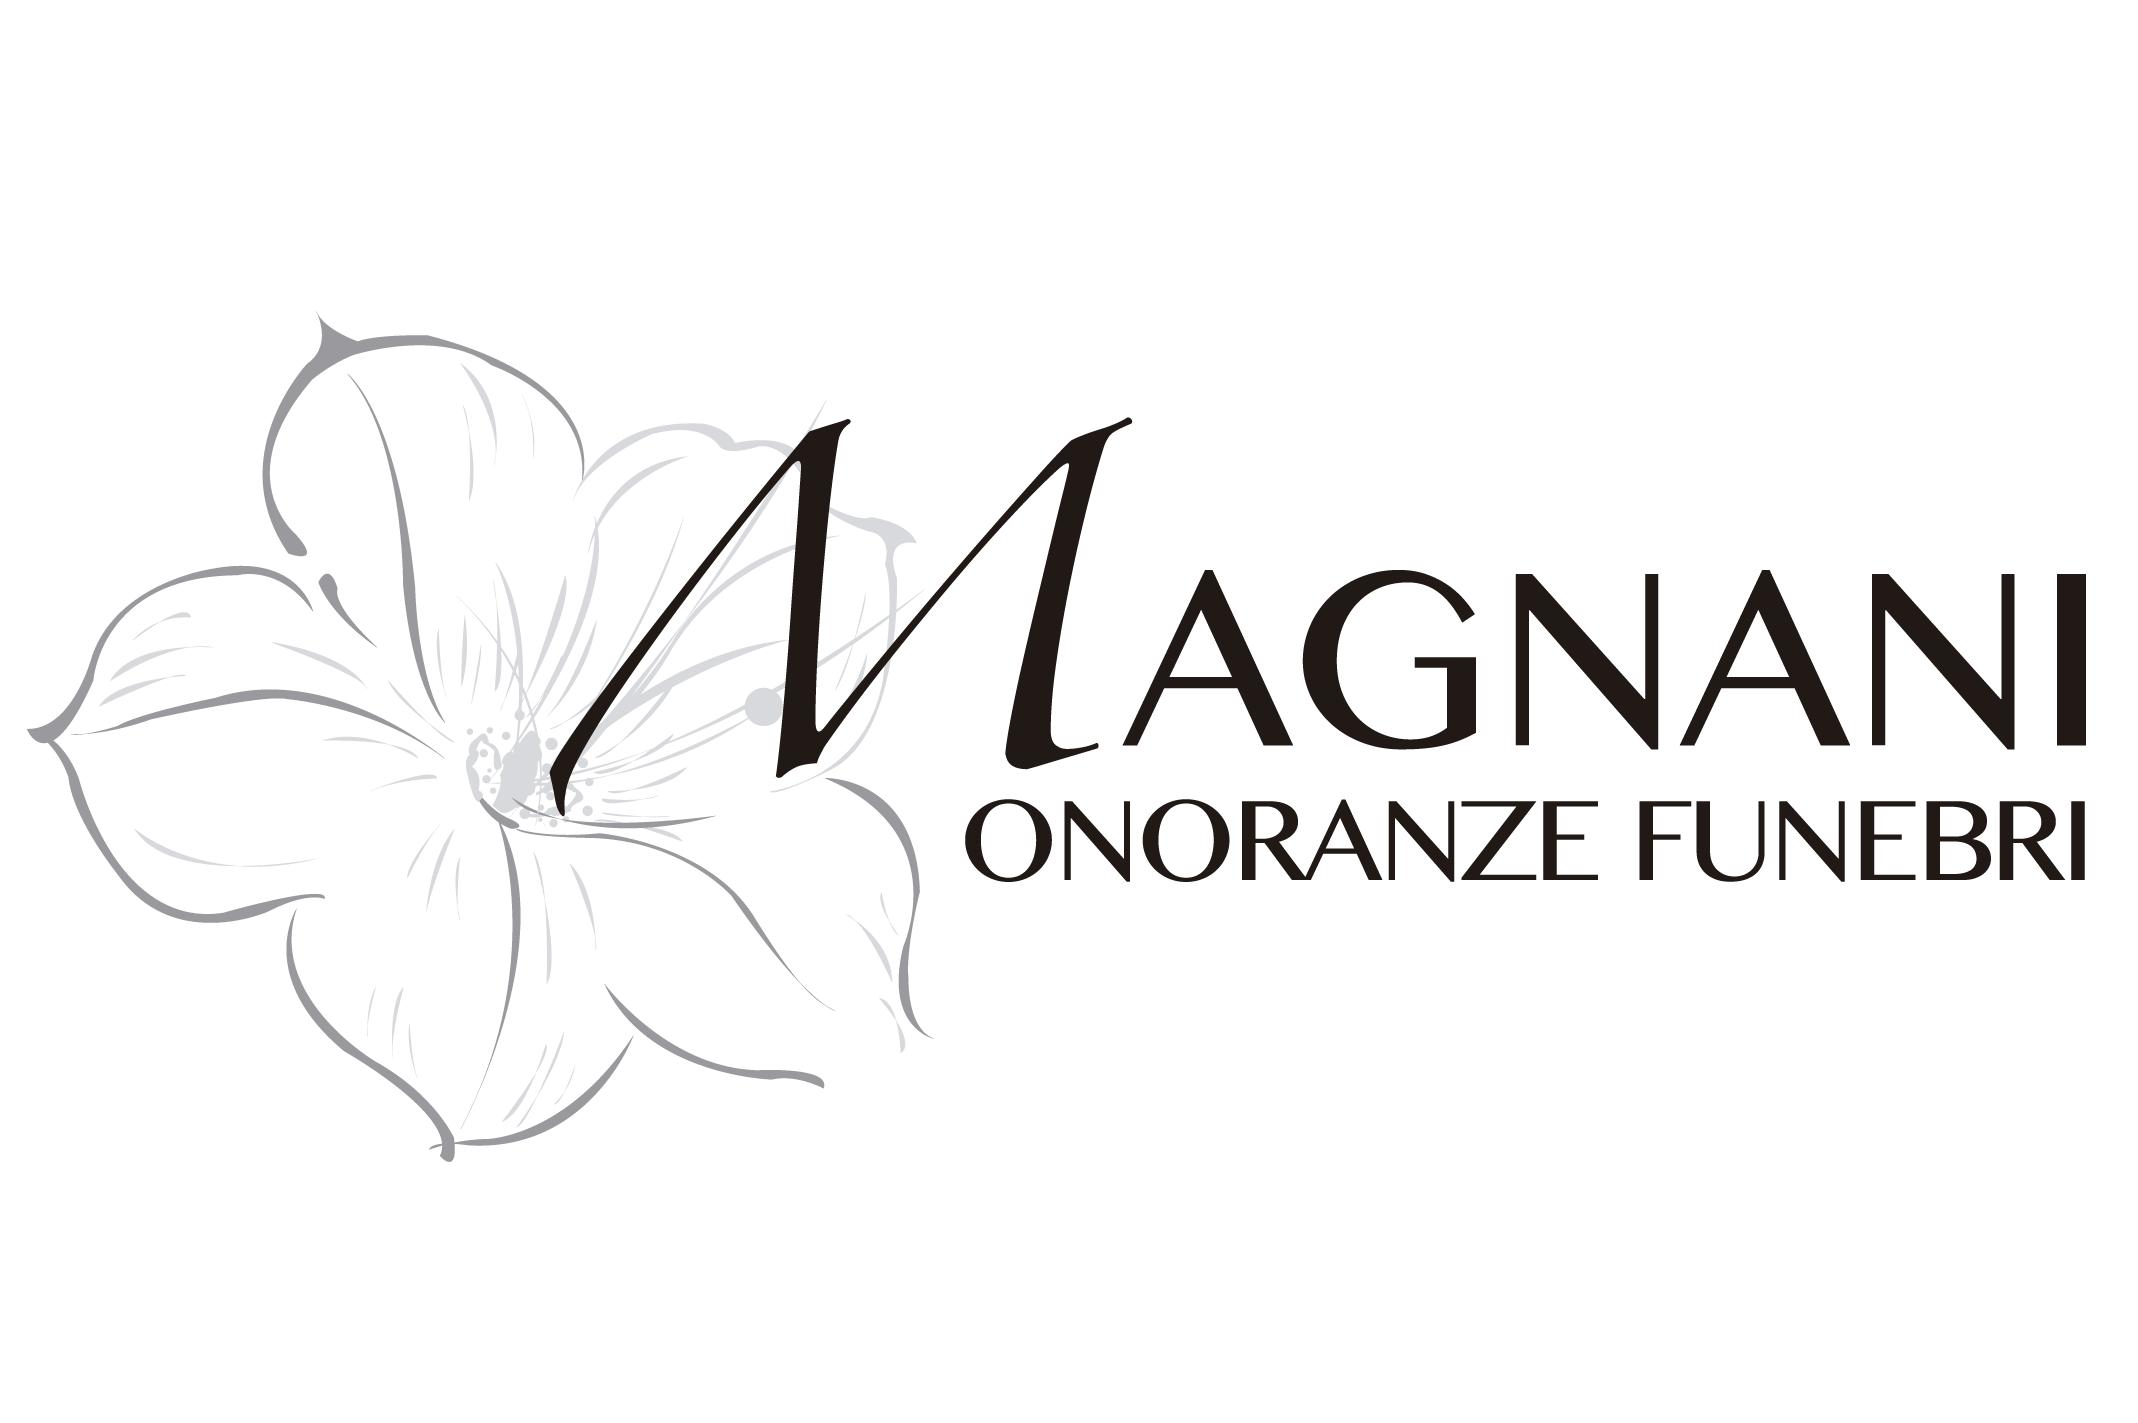 Onoranze Funebri MAGNANI